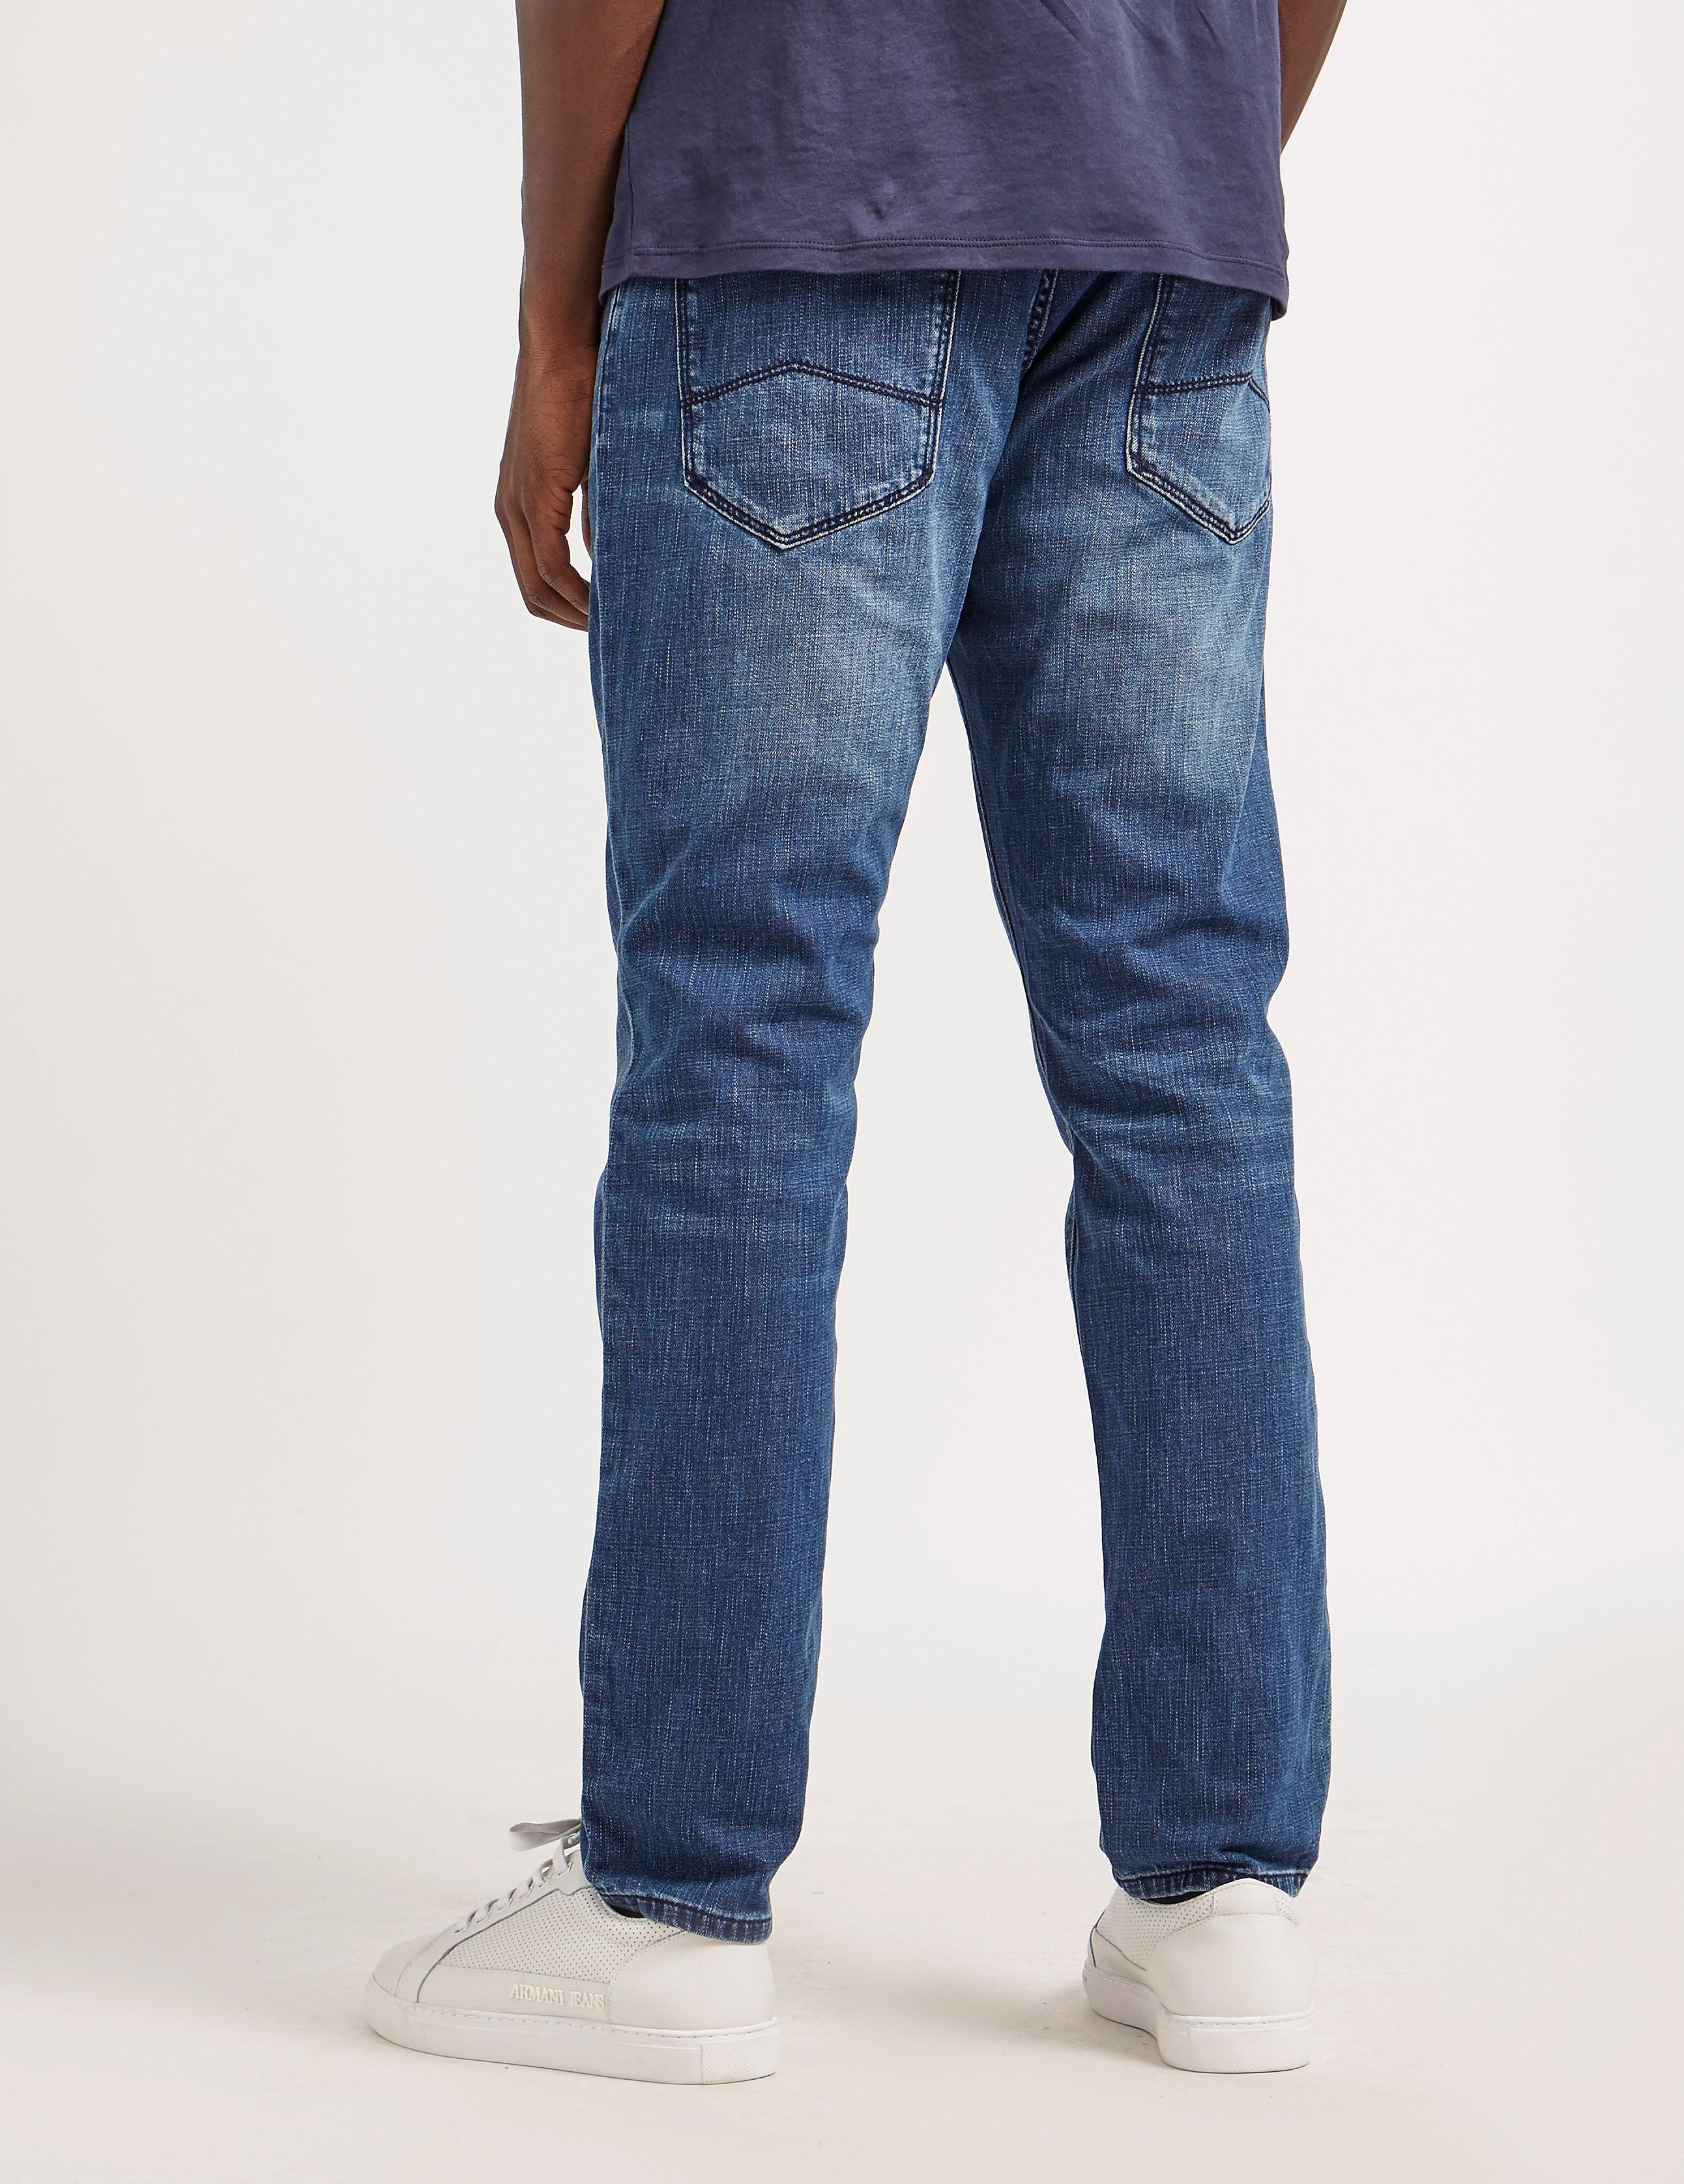 Armani Jeans J06 Short Jeans